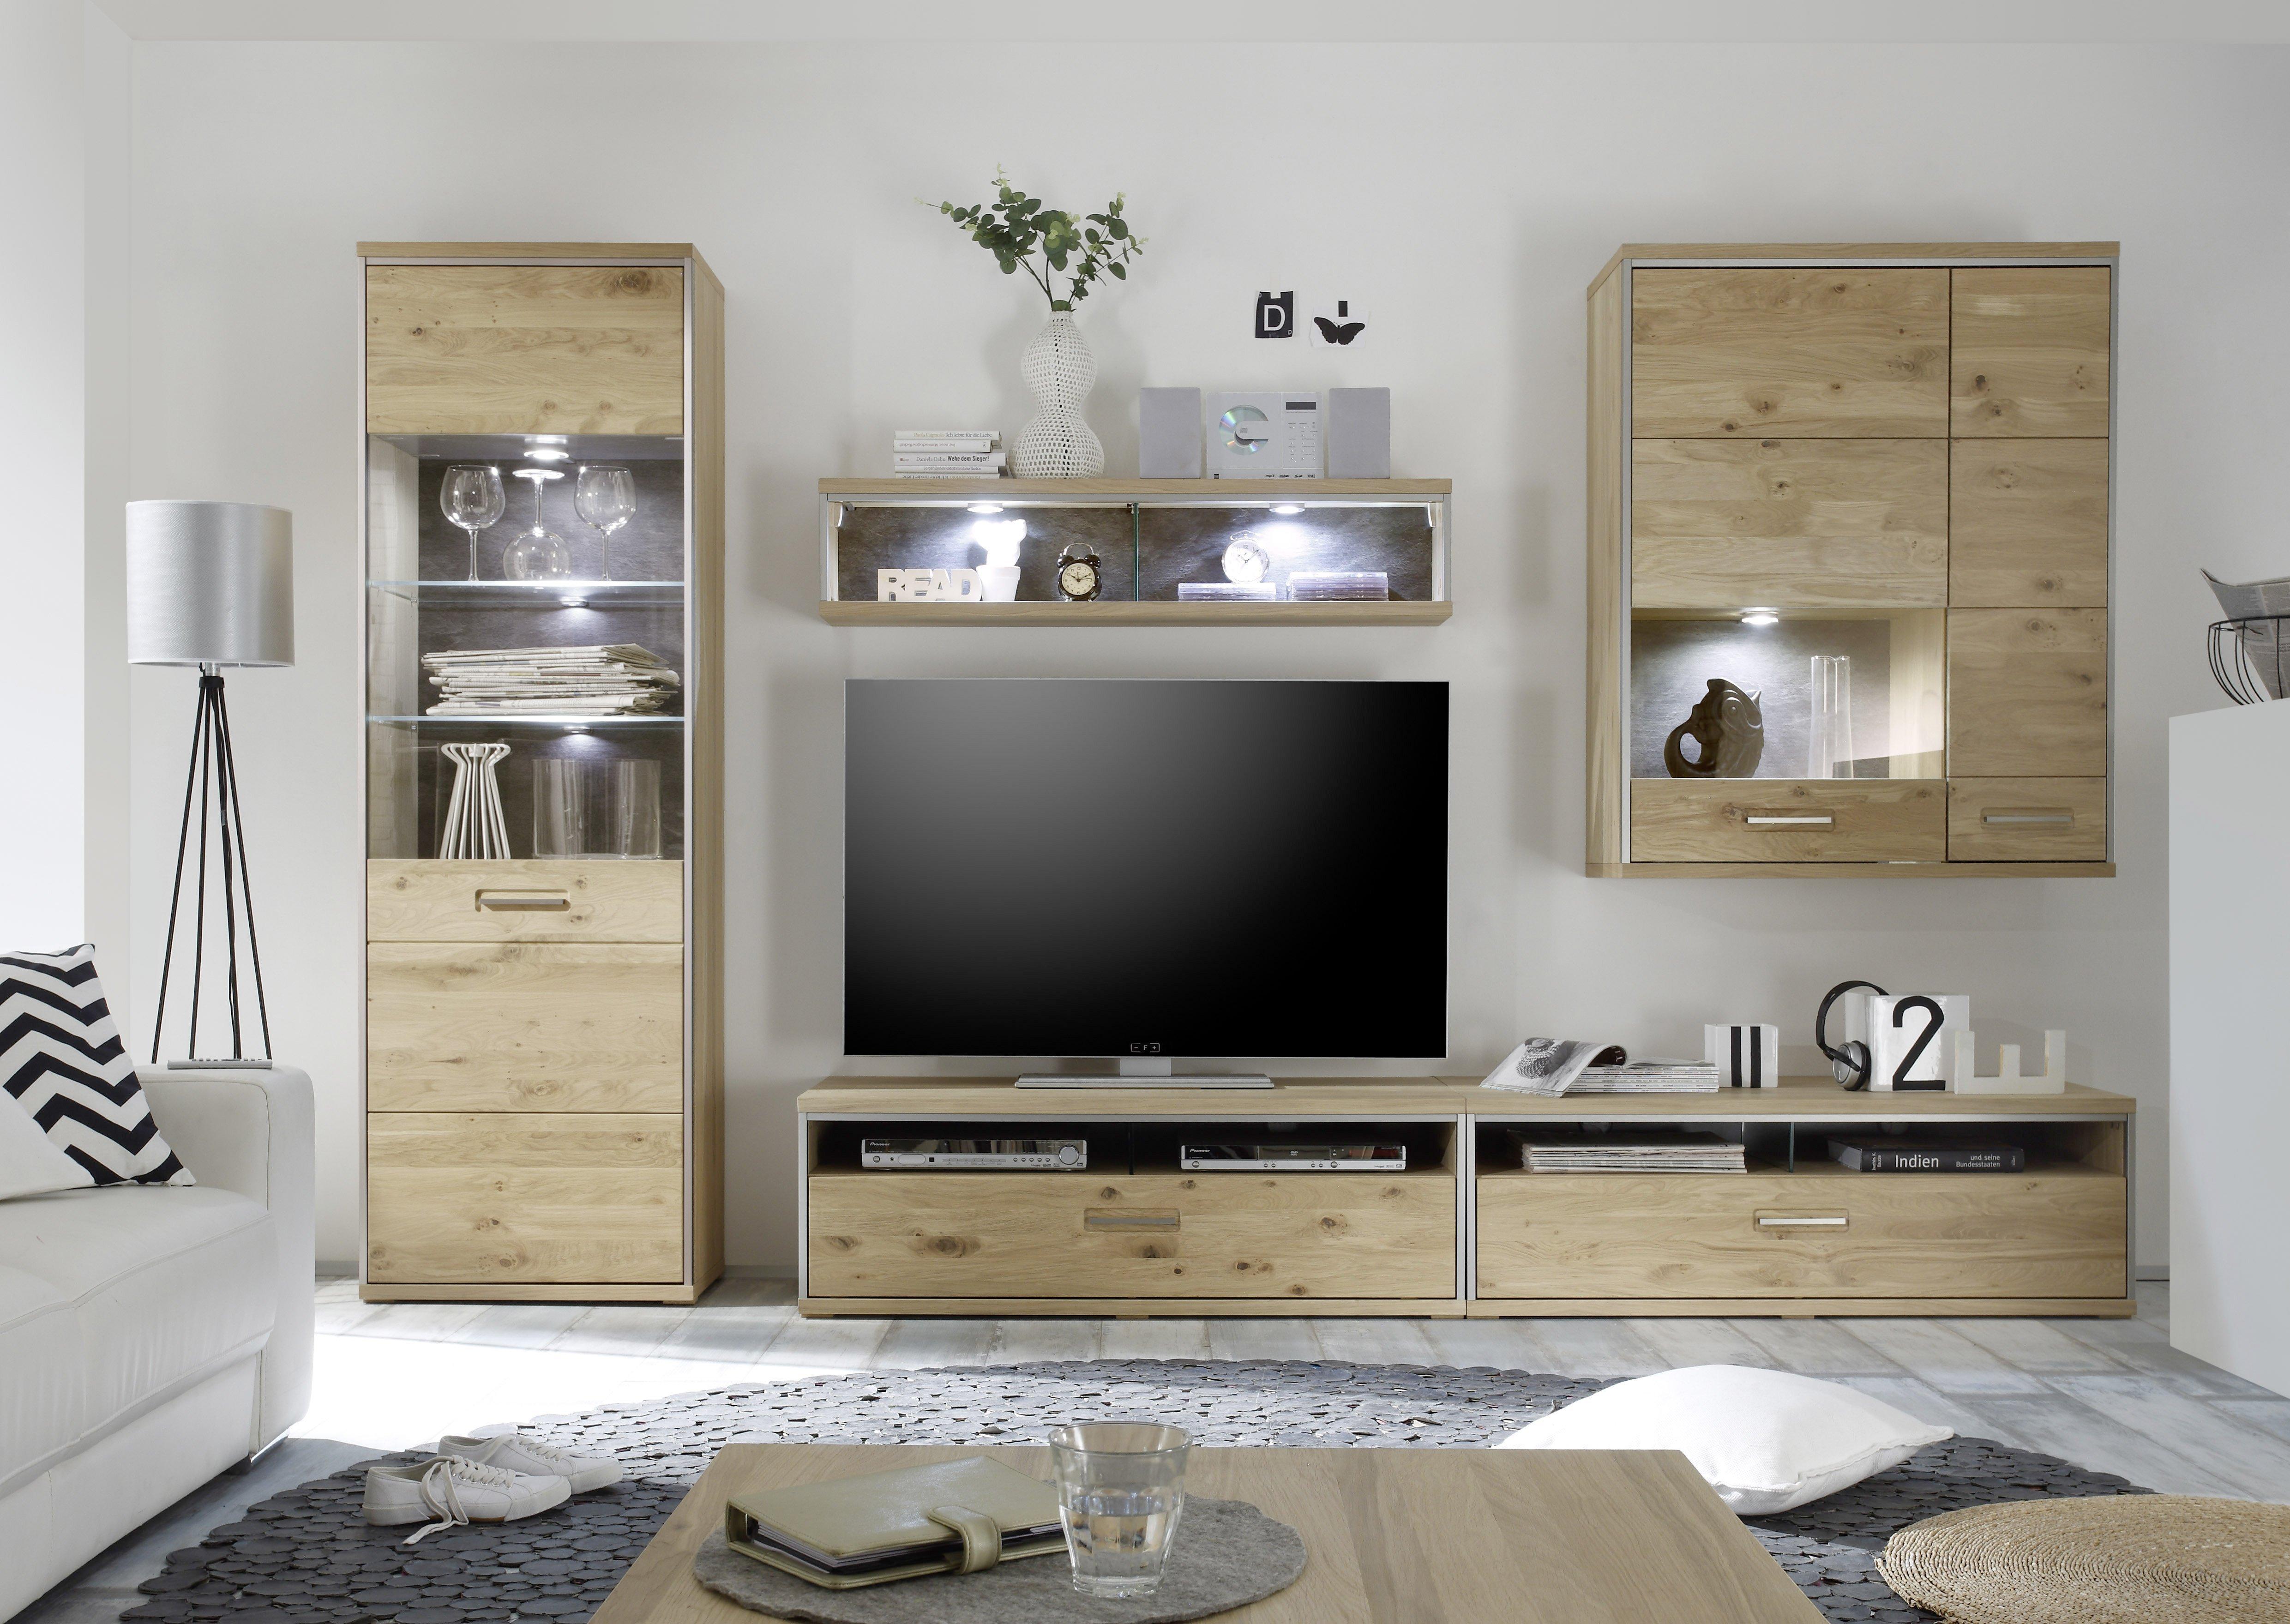 Anbauwand Espero W02 von MCA furniture